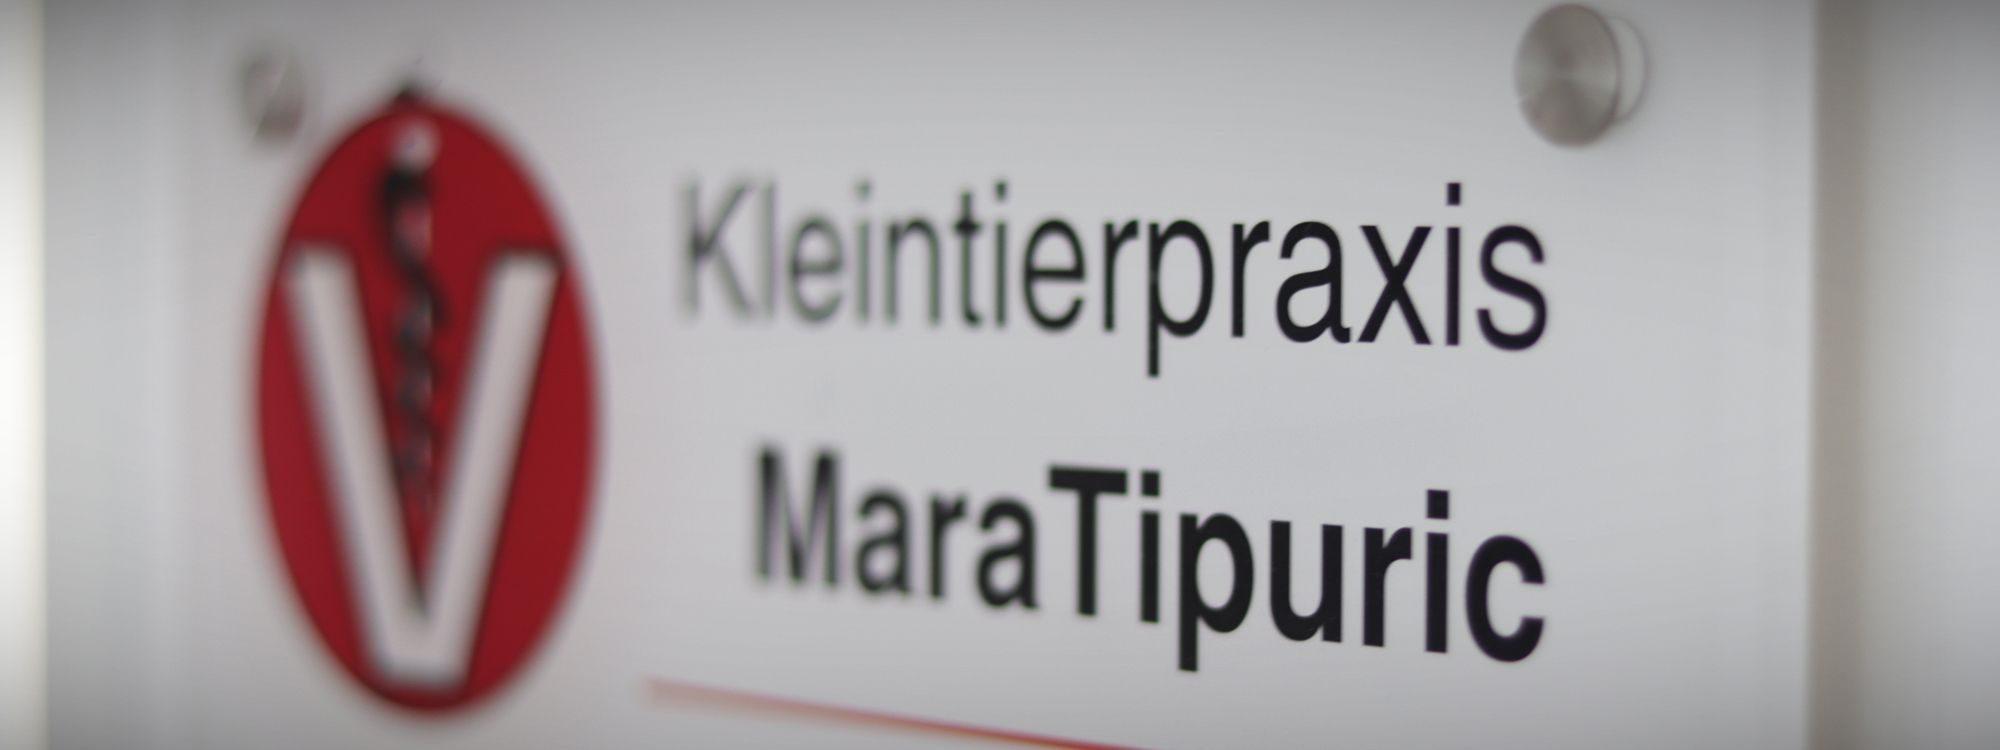 TierarztKarlsfeldTipuric03